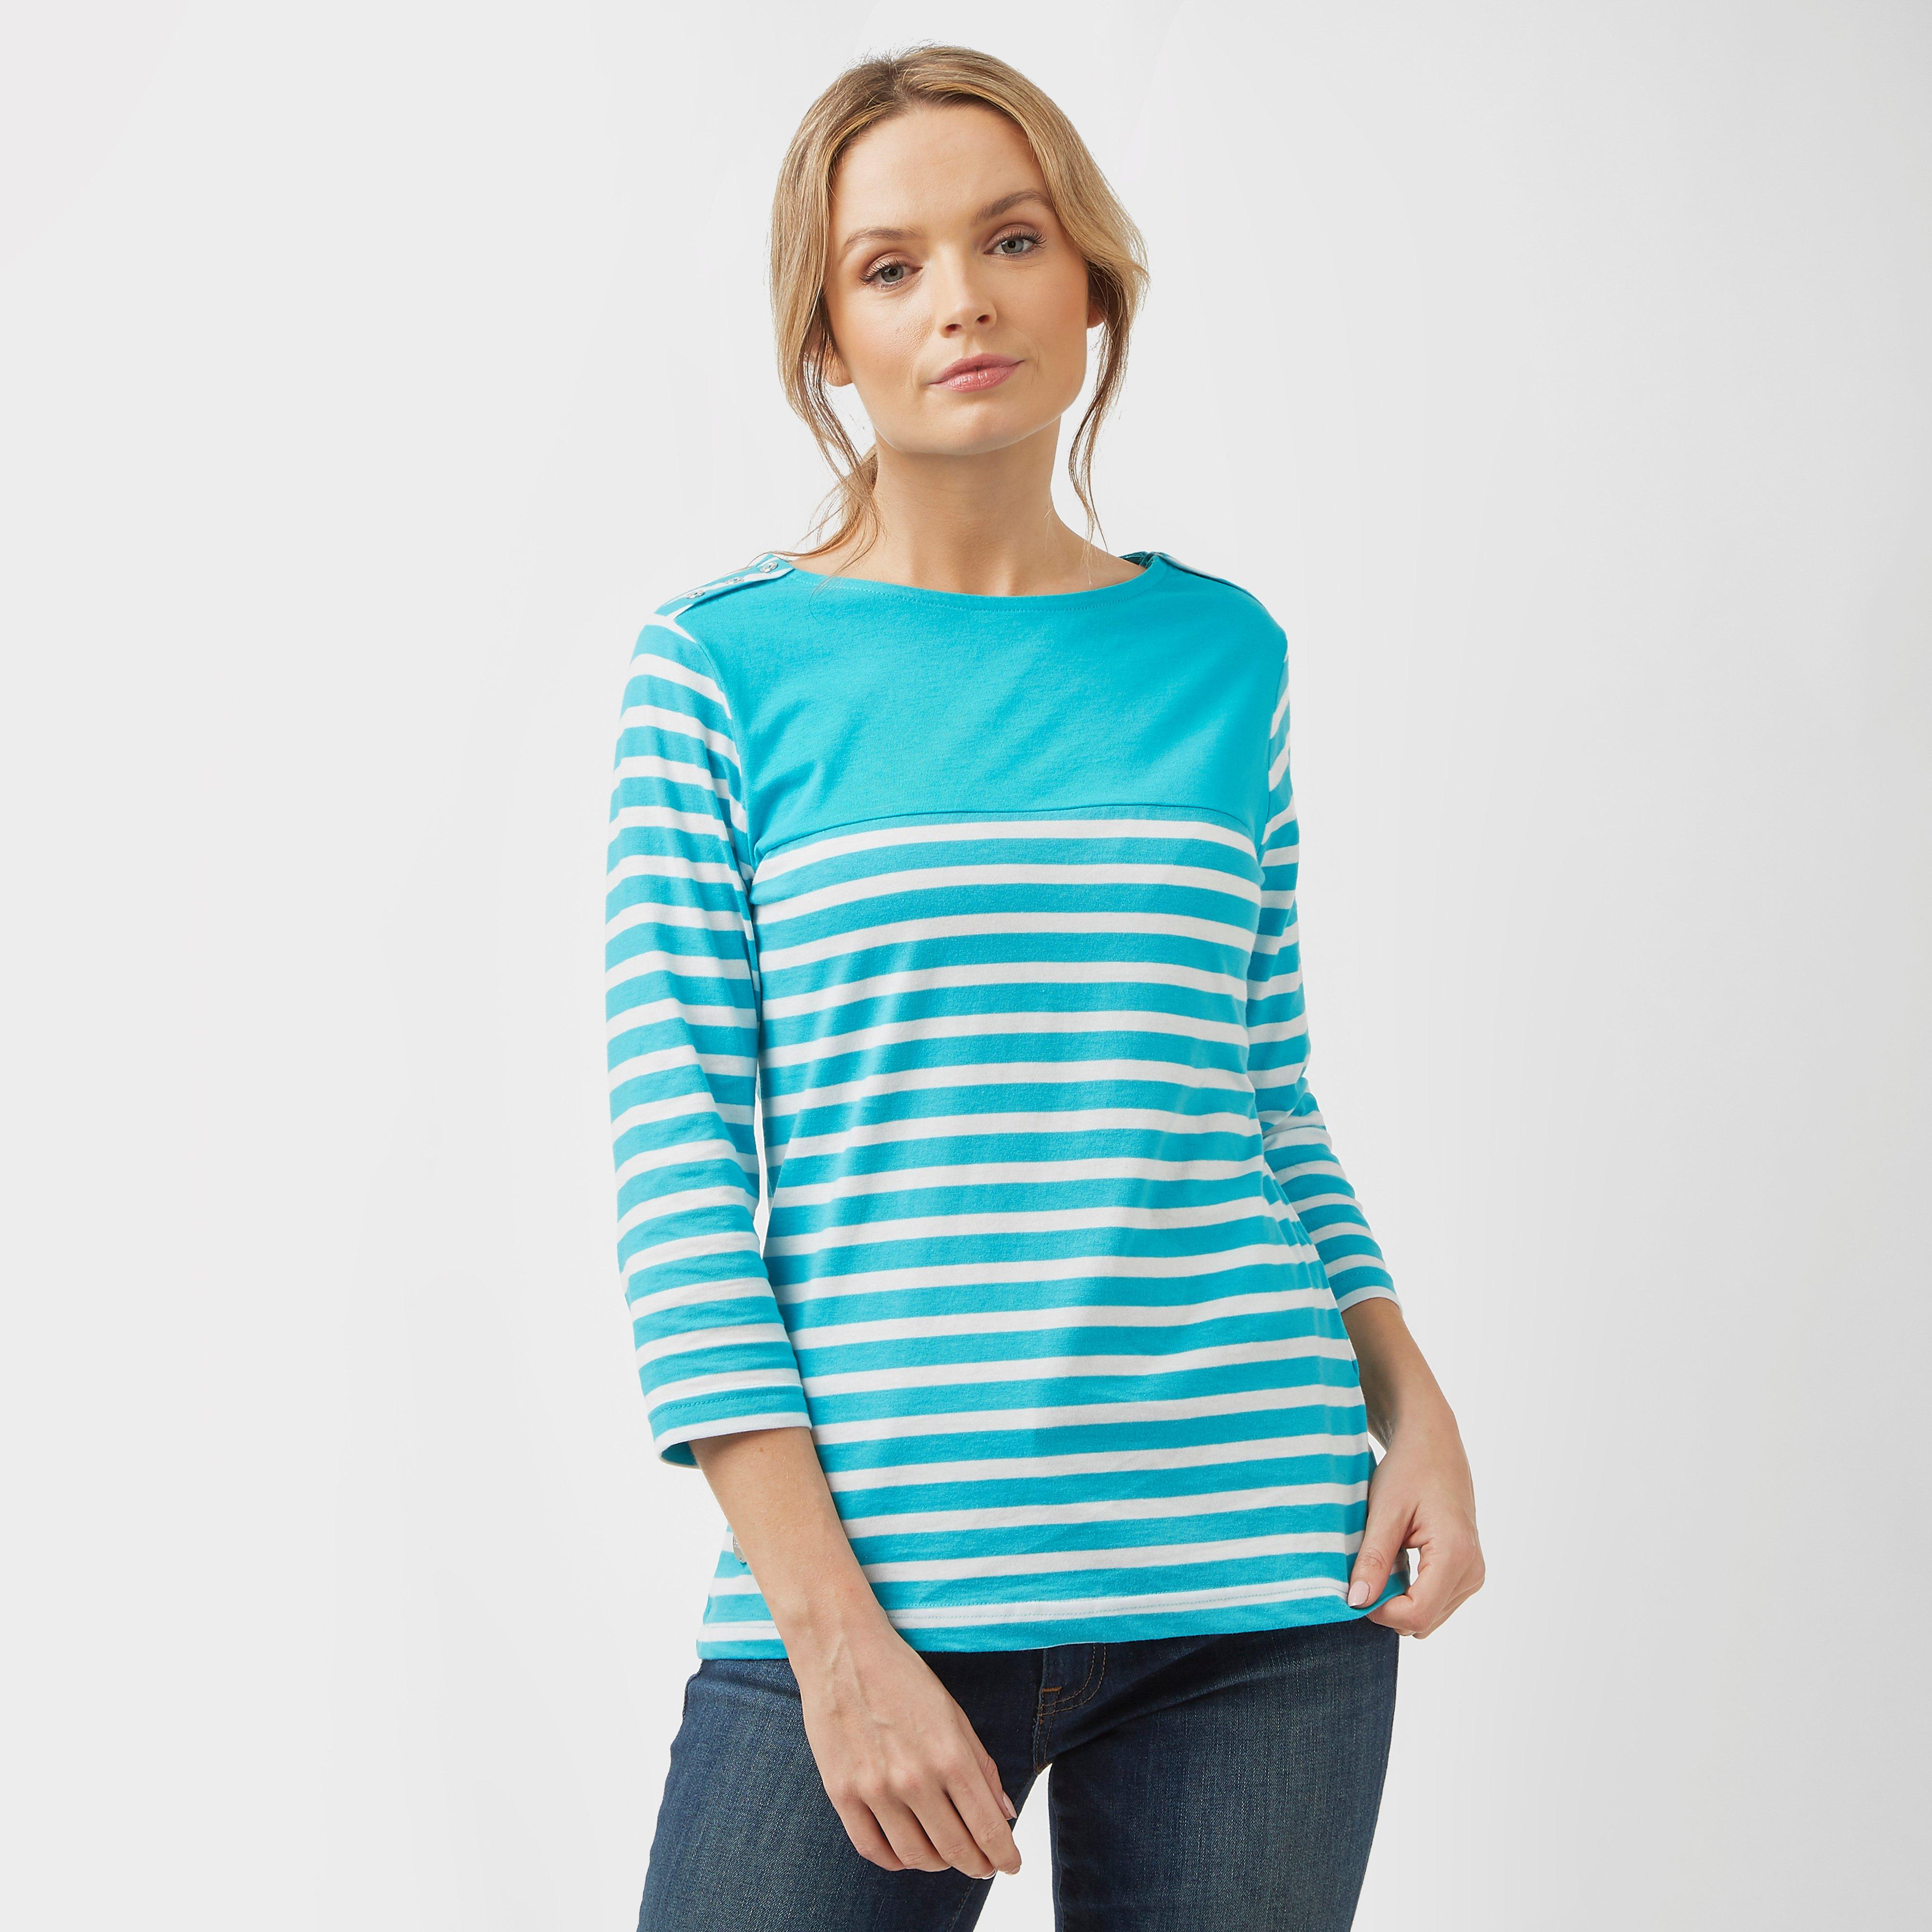 Regatta Regatta Womens Pandara Striped T- Shirt - Blue, Blue